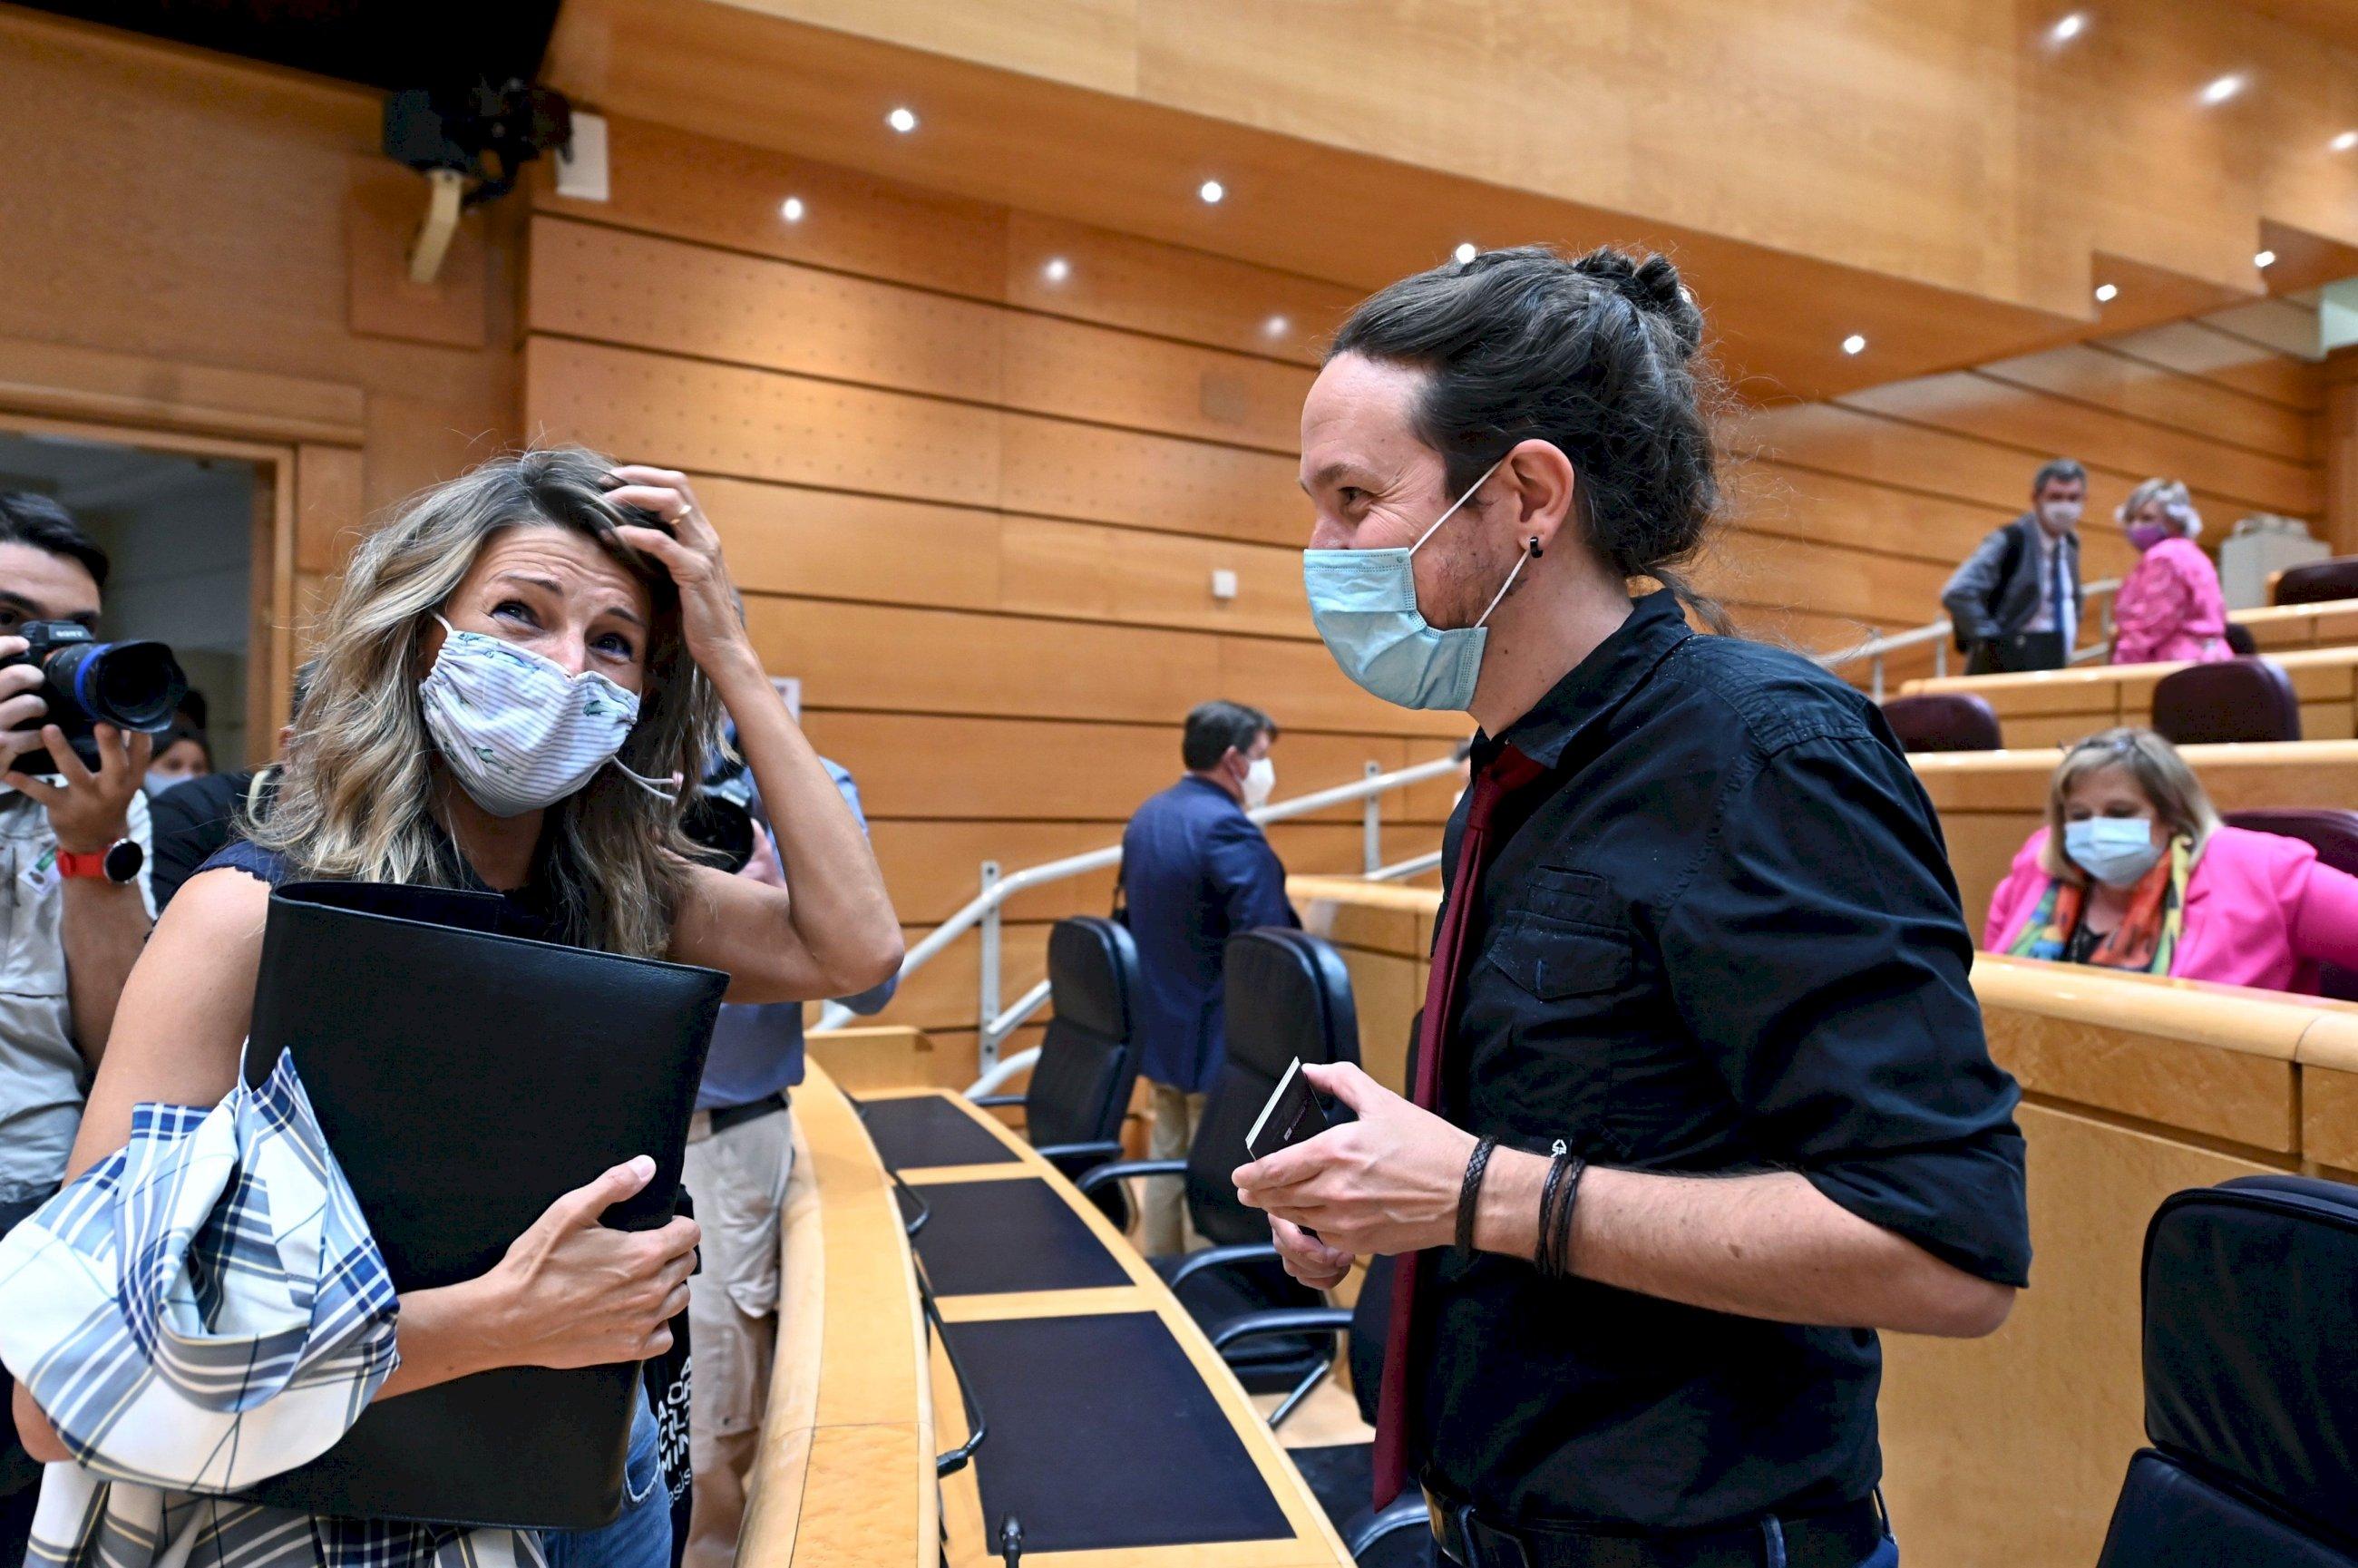 Yolanda Díaz gana a Pablo Iglesias hasta entre los votantes de Podemos